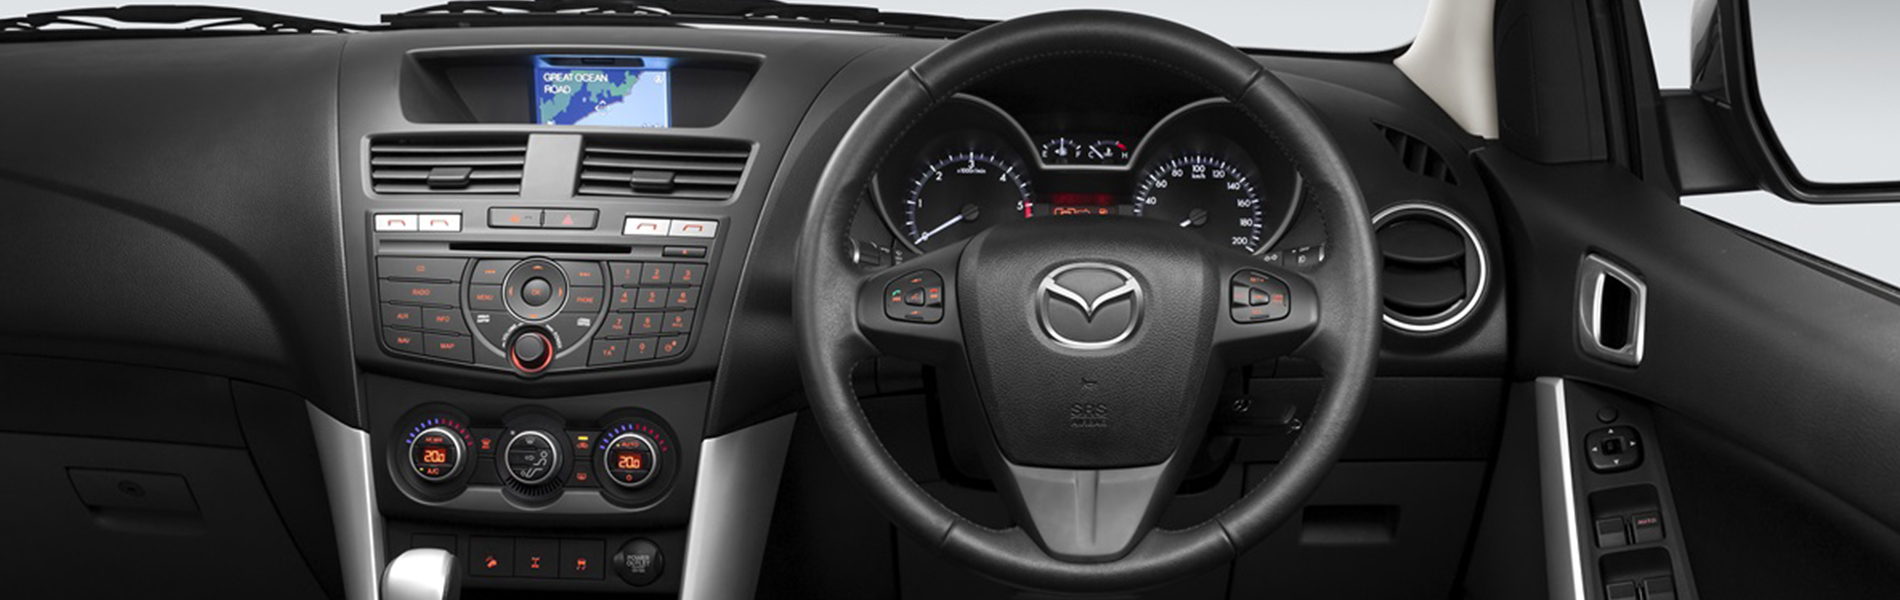 Mazda BT-50 Image 5